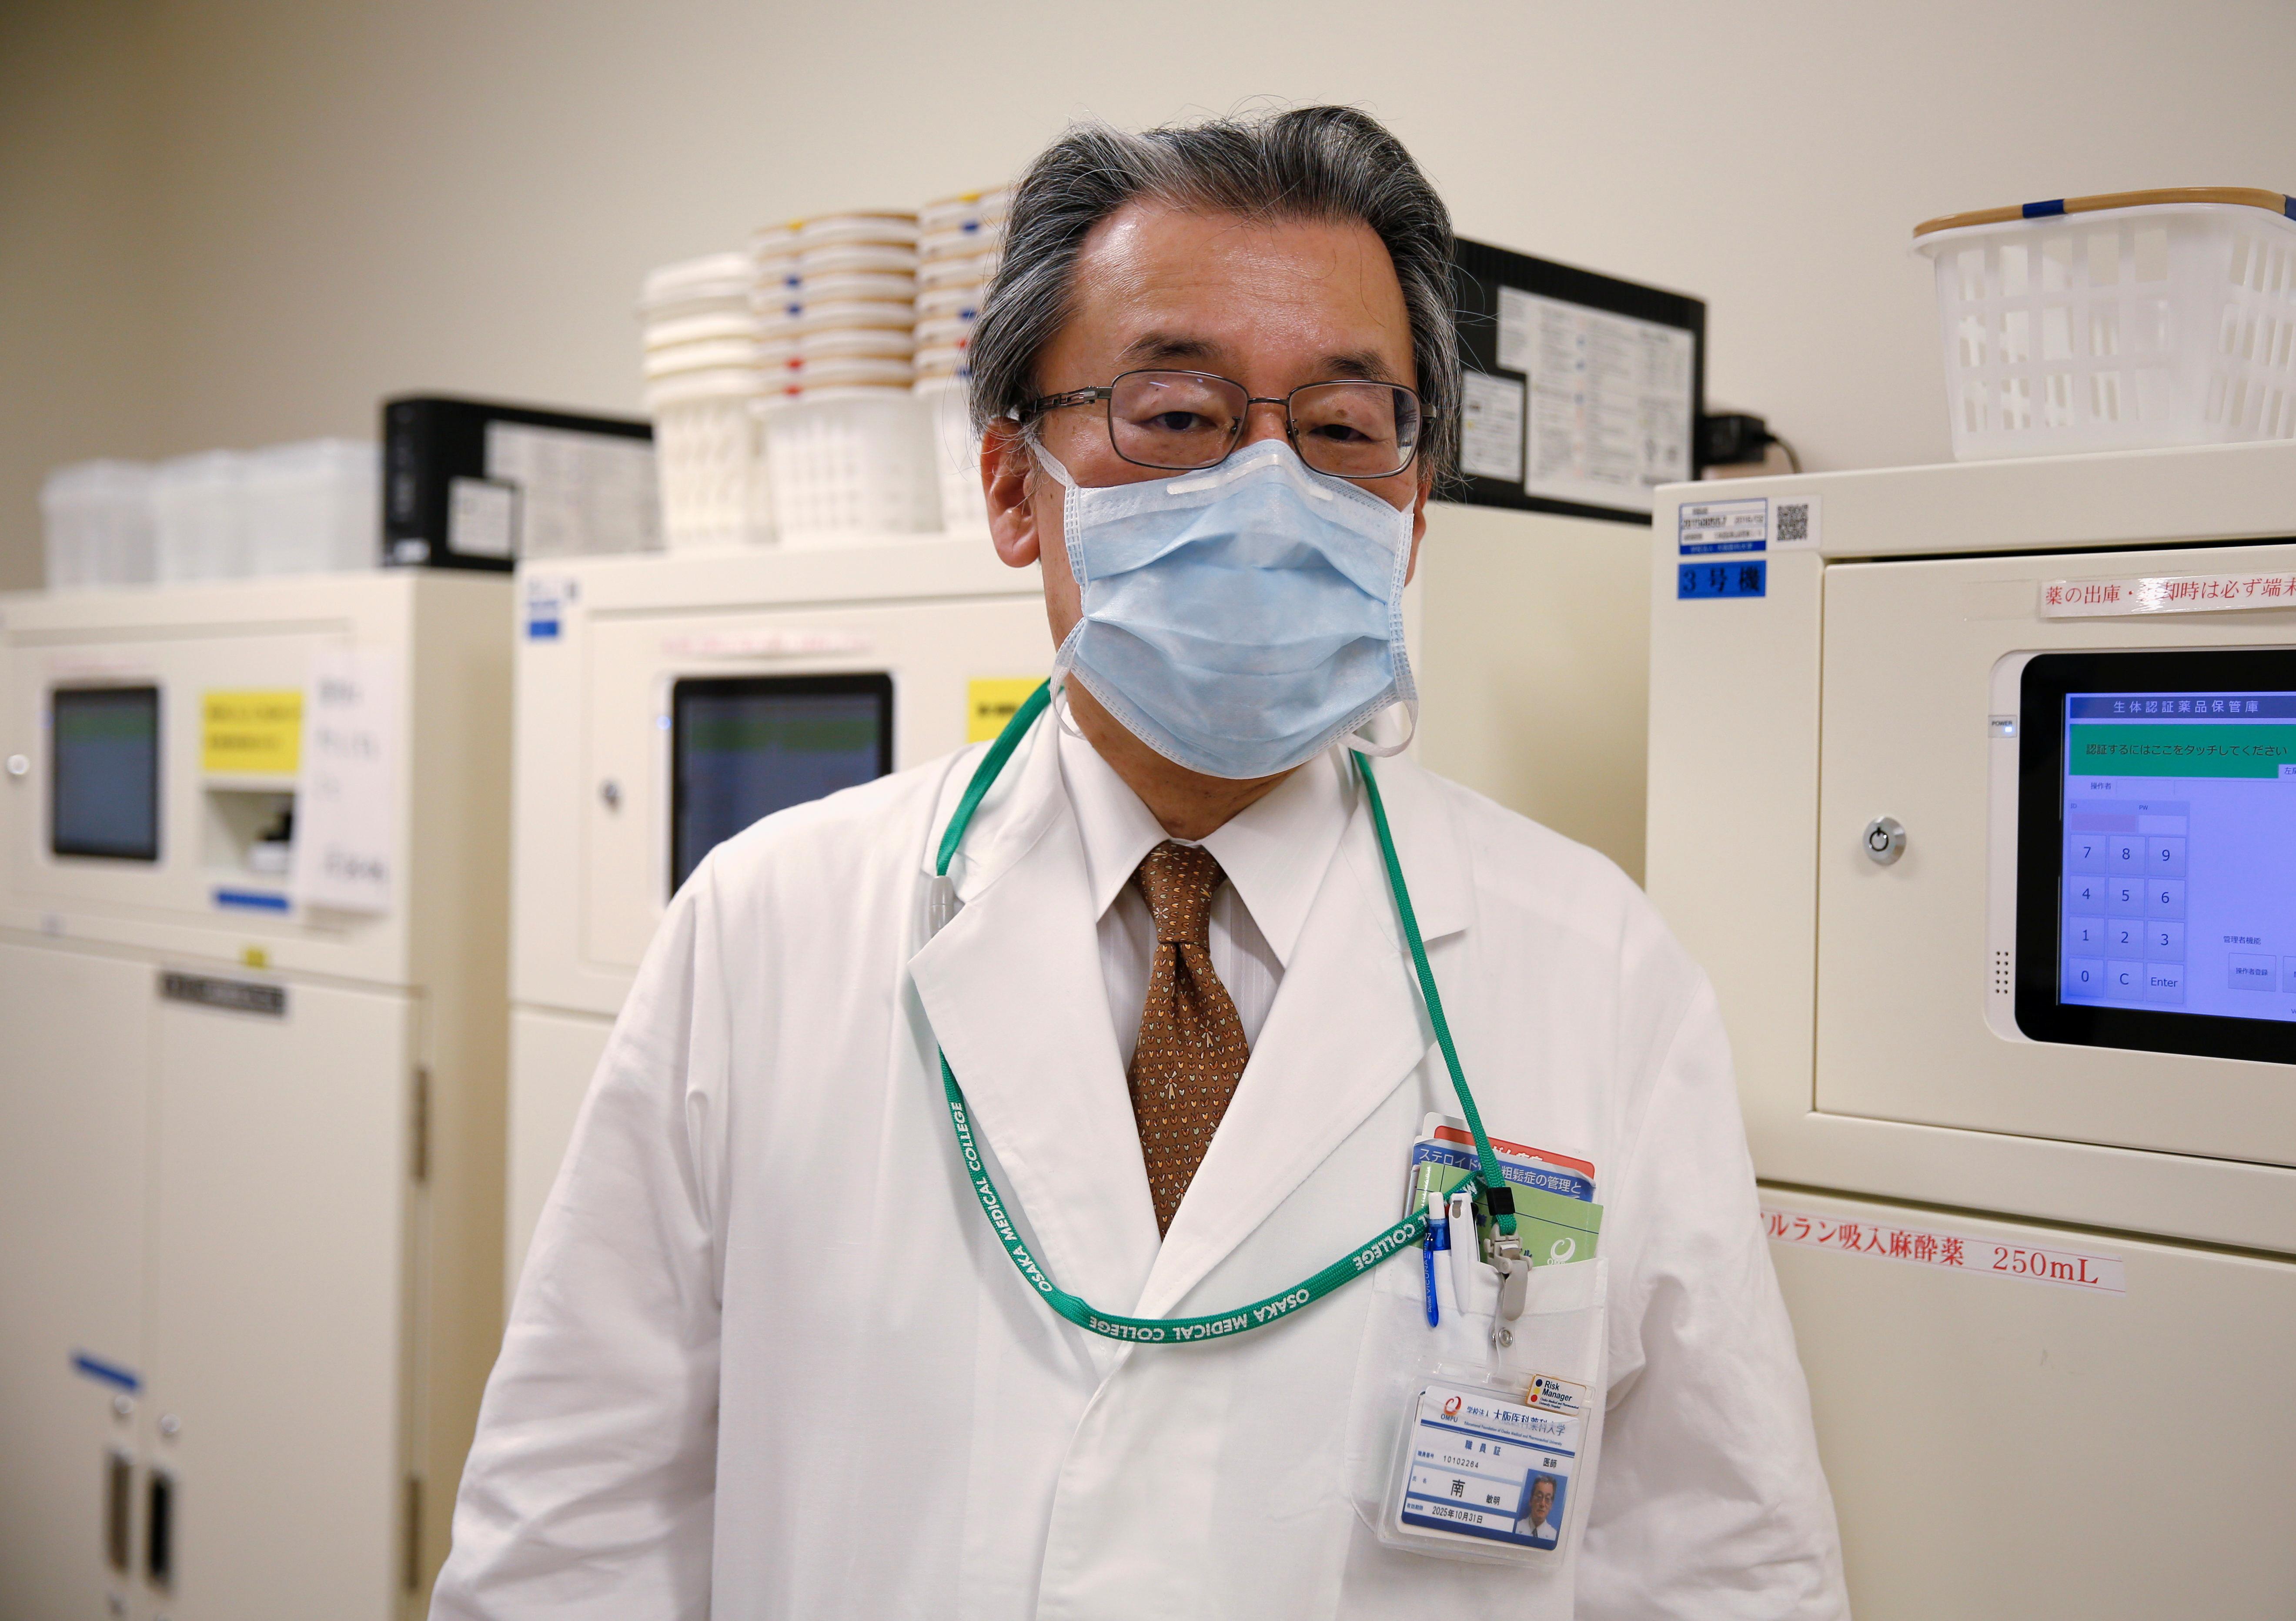 Doctor Toshiaki Minami, director at Osaka Medical and Pharmaceutical University Hospital, poses for a photograph at a drug storage at the hospital, amid the coronavirus disease (COVID-19) pandemic, in Takatsuki, Osaka prefecture, Japan May 17, 2021. REUTERS/Akira Tomoshige